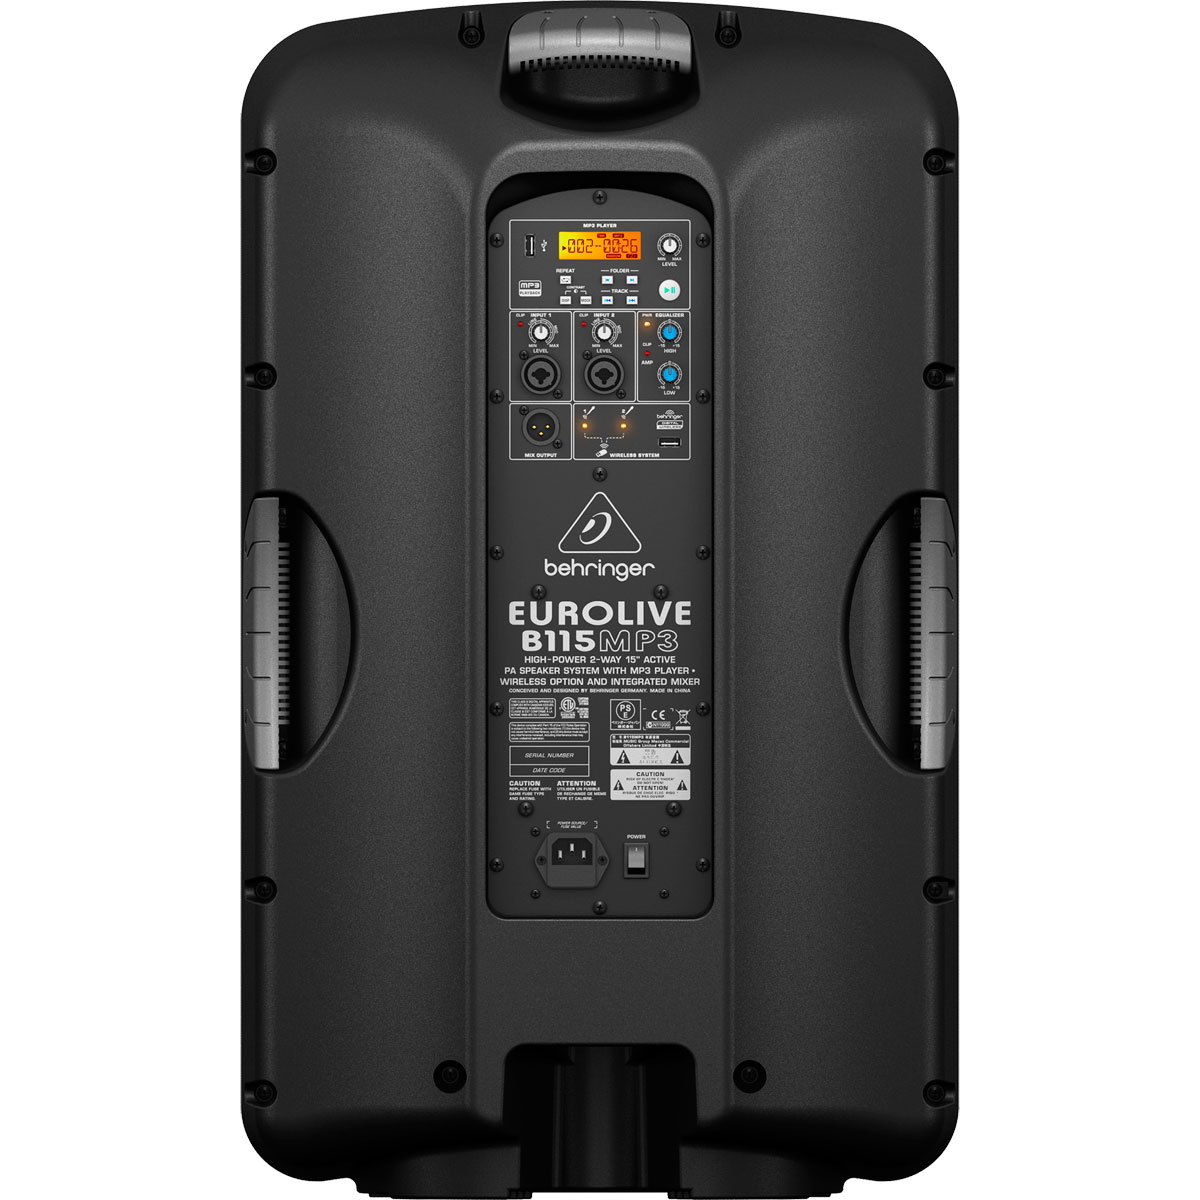 Caixa Ativa Fal 15 Pol 1000W c/ USB - B115 MP3 Behringer 110V